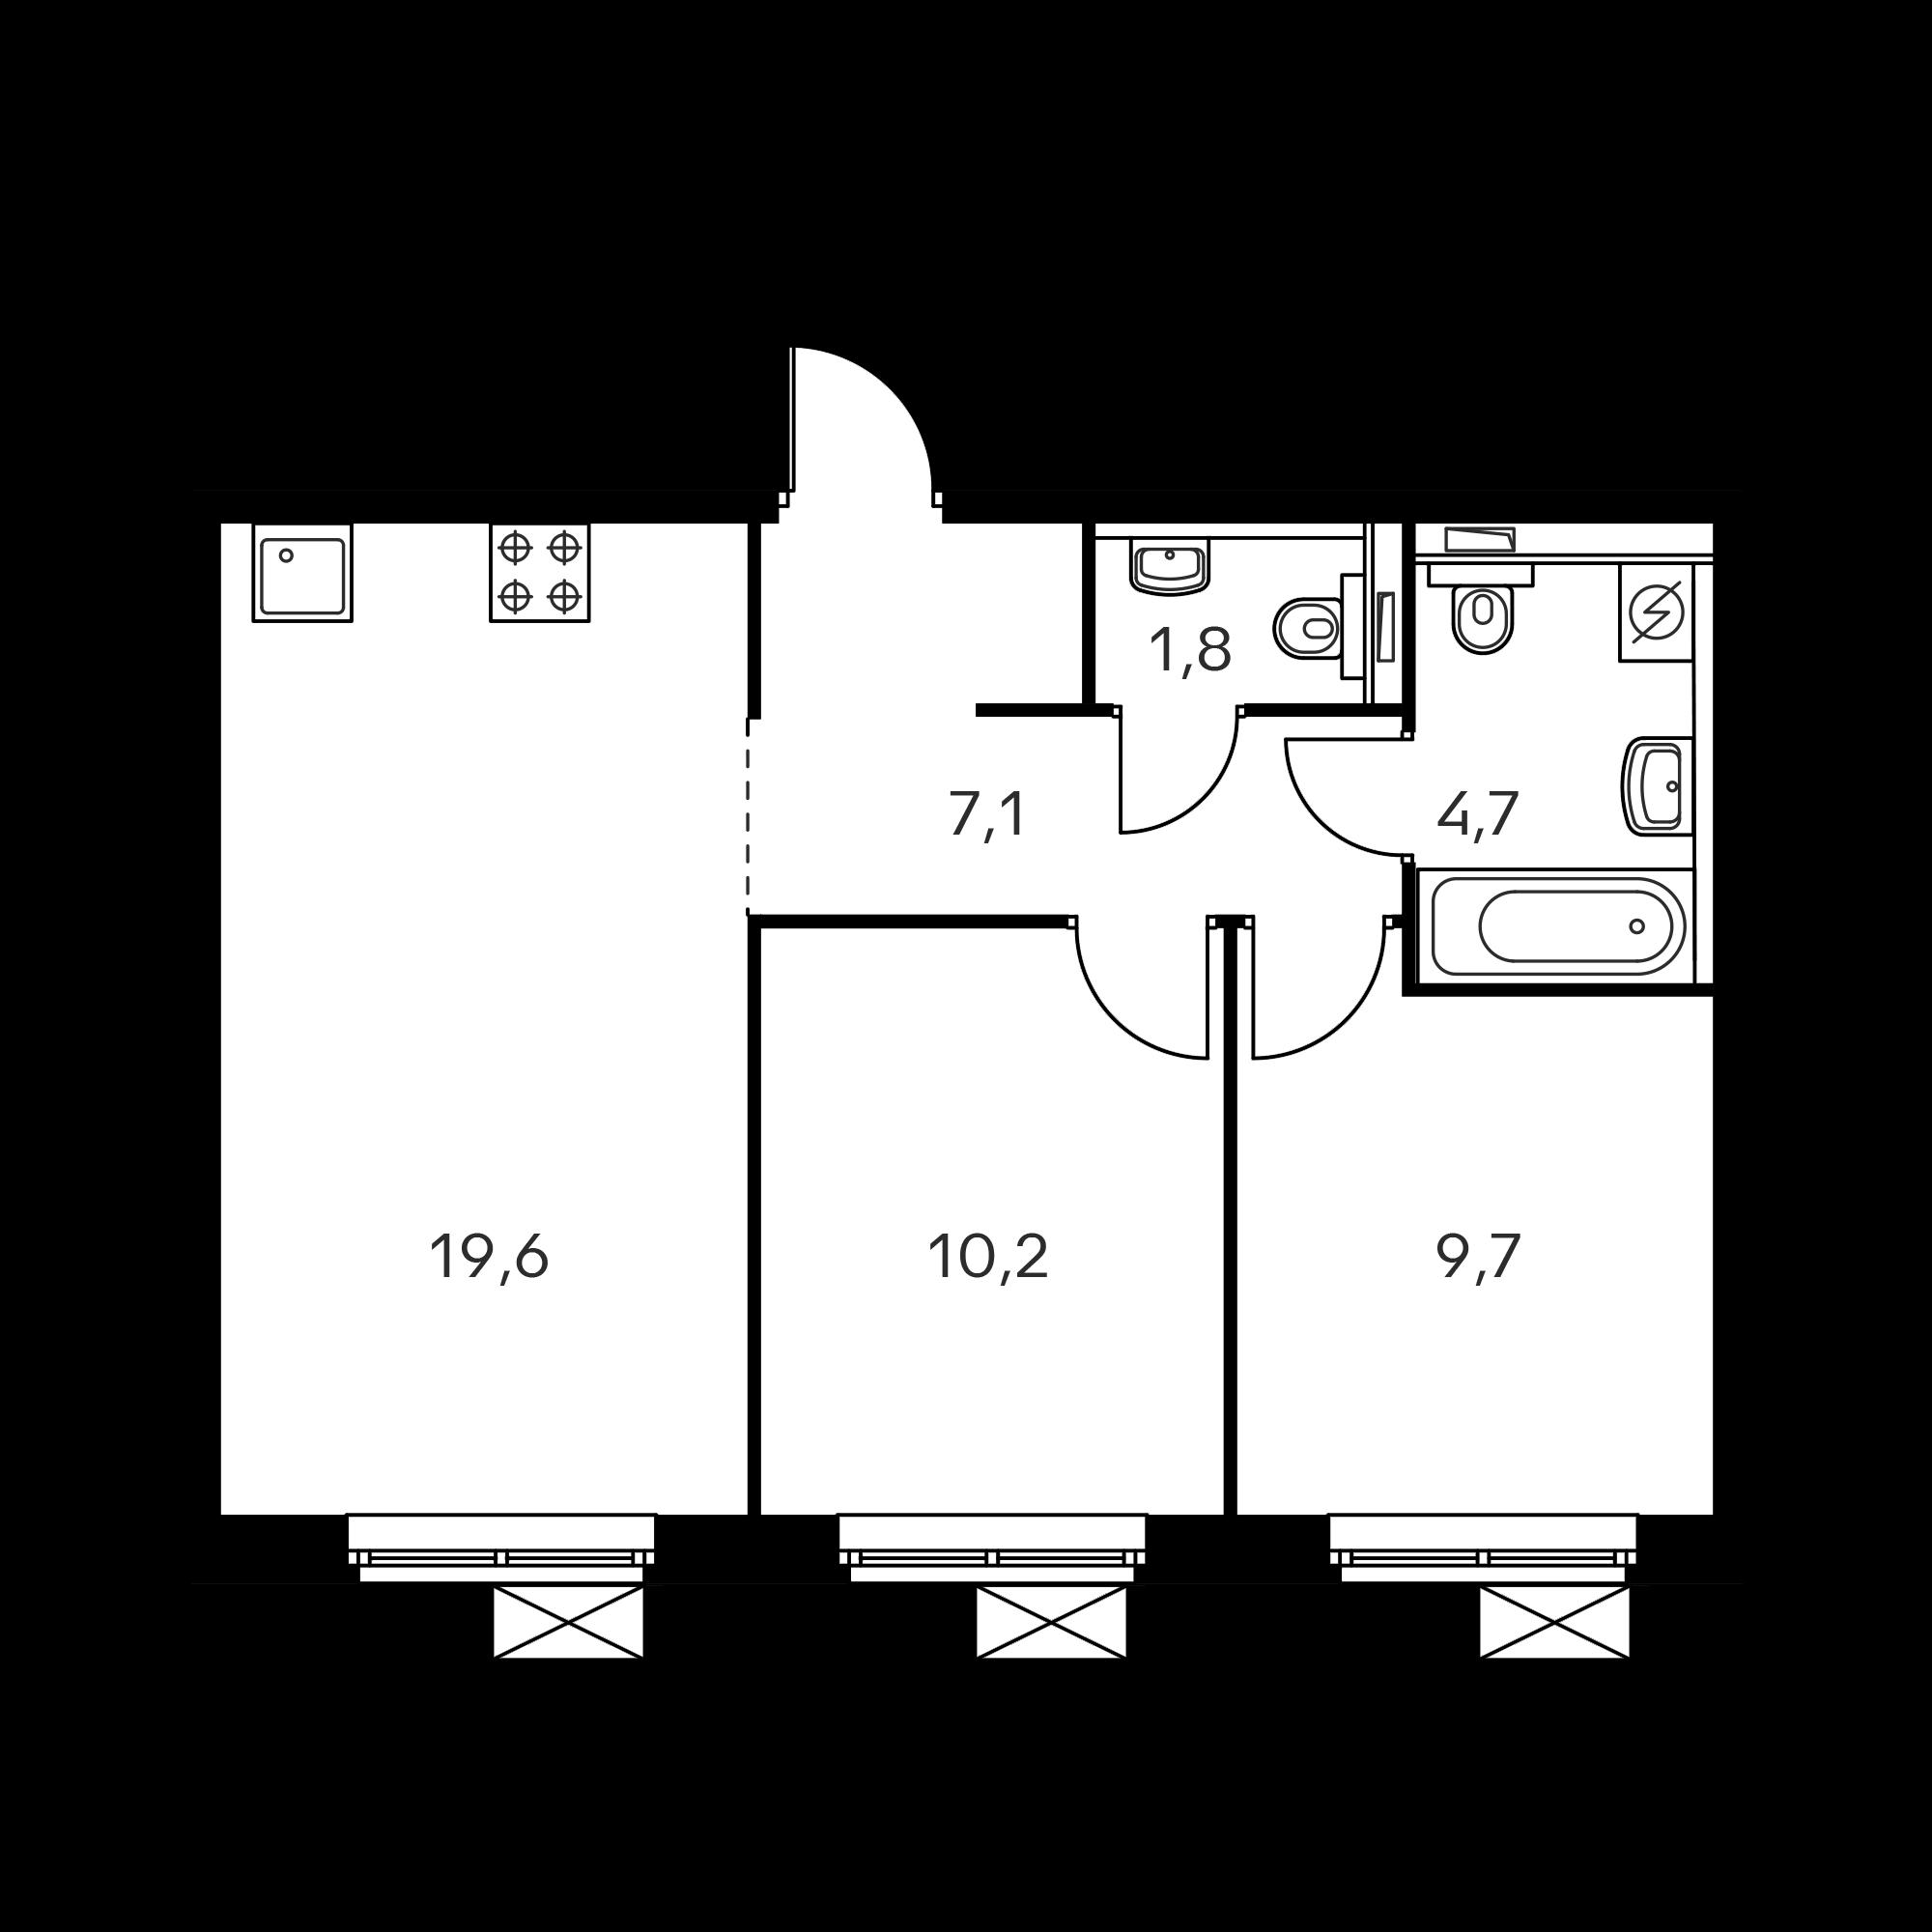 2ES9_9.3-1_S_Z-6